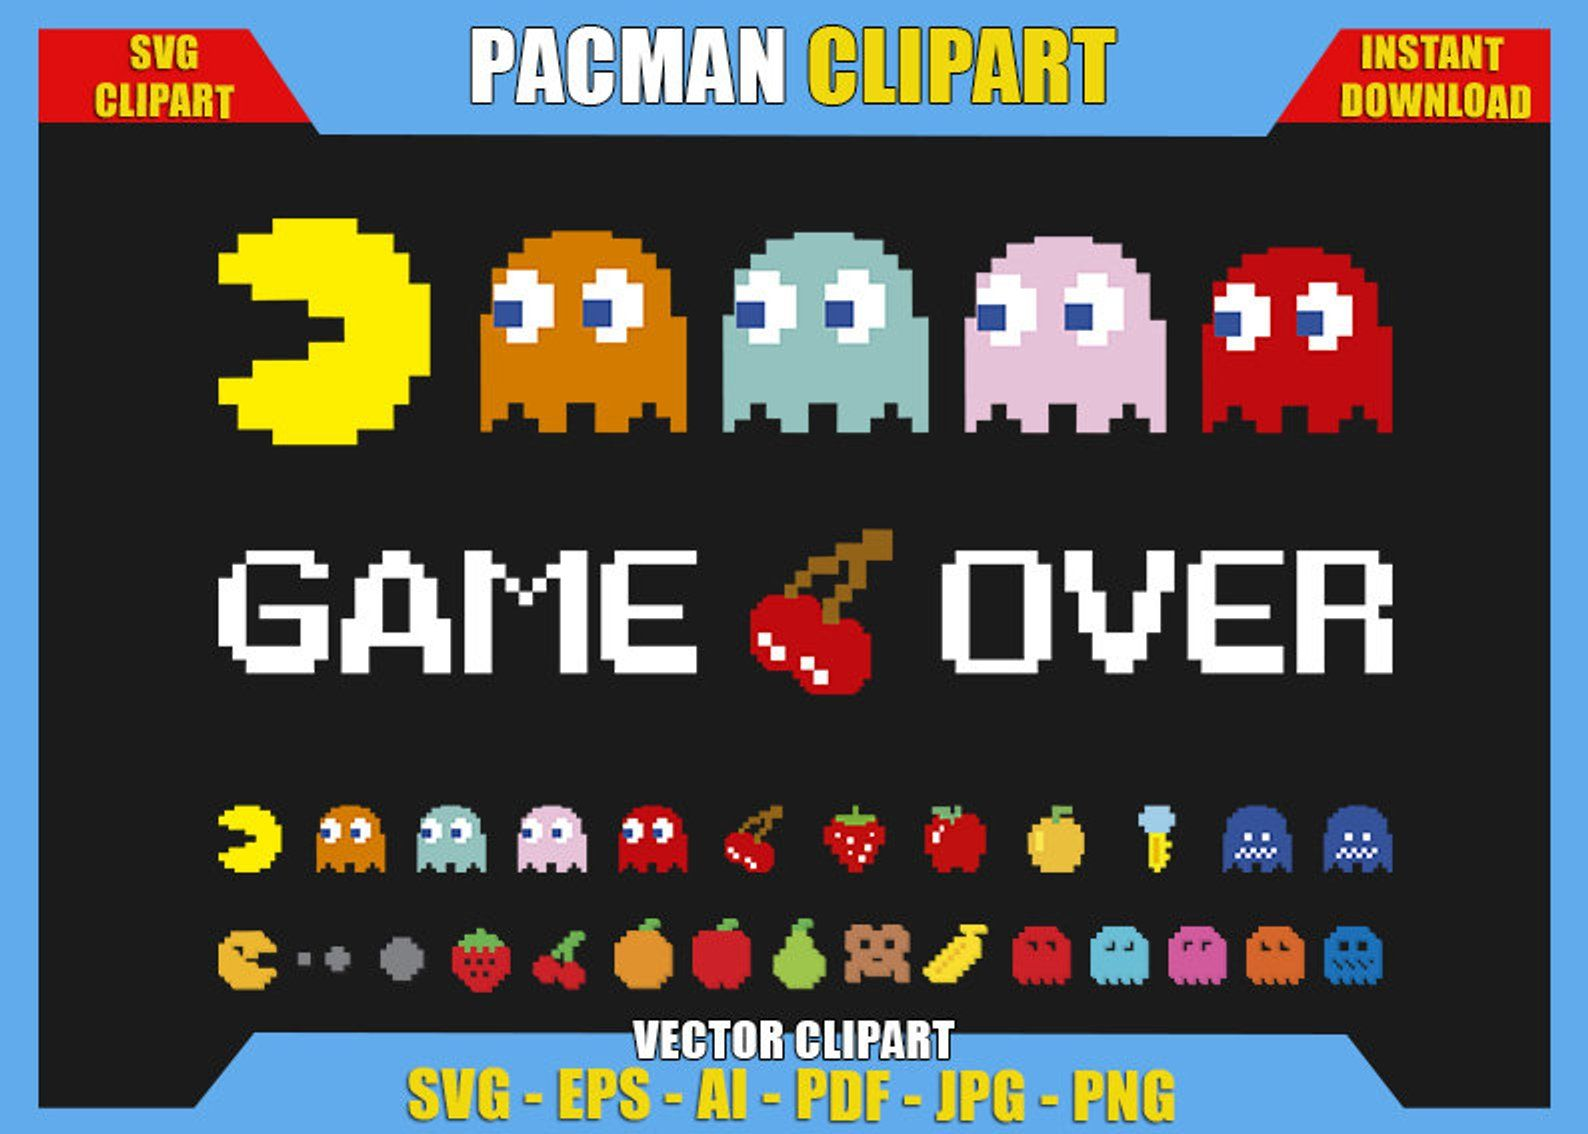 Pacman Clipart Svg Dxf Png Digital Logo Silhouette Cricut Etsy Clip Art Logo Silhouette Pacman